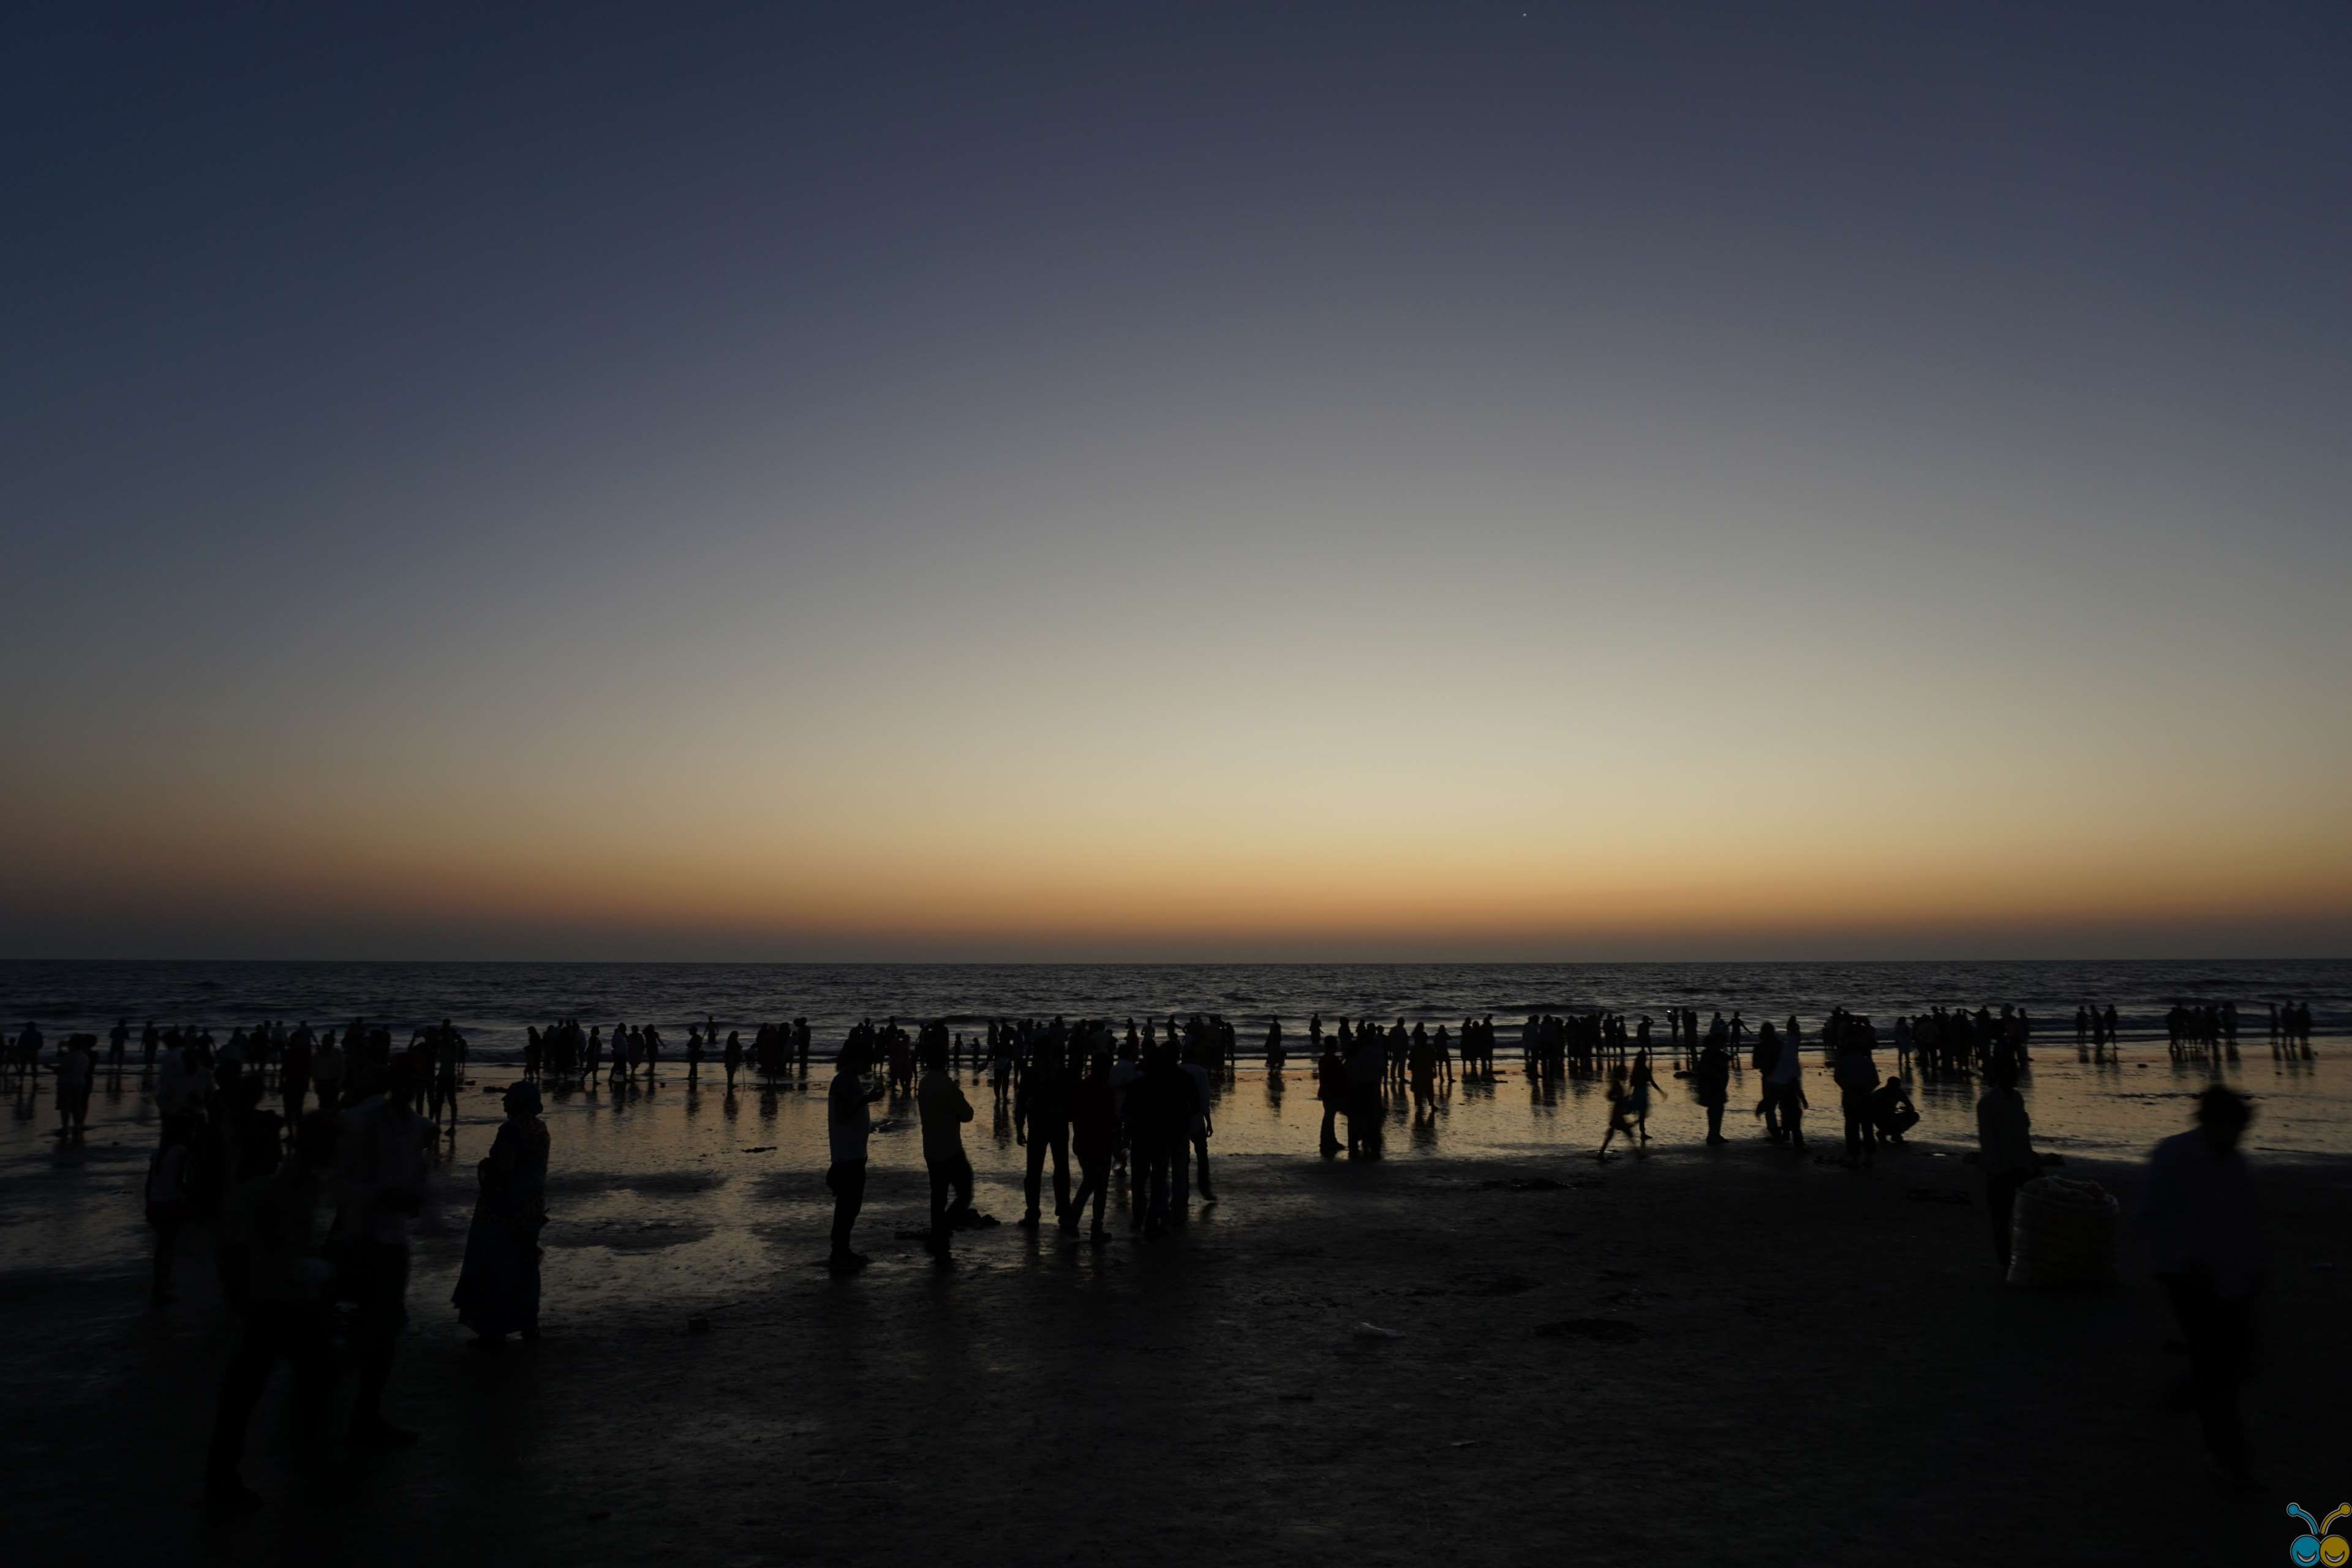 #beach #black #clouds #dark clouds #dawn #dock #evening #evening sky #evening sun #grey sky #landscape #ocean #outdoors #pier #reflections #sand #sea #sea beach #seascape #seashore #silhouette #sky #sunset #water